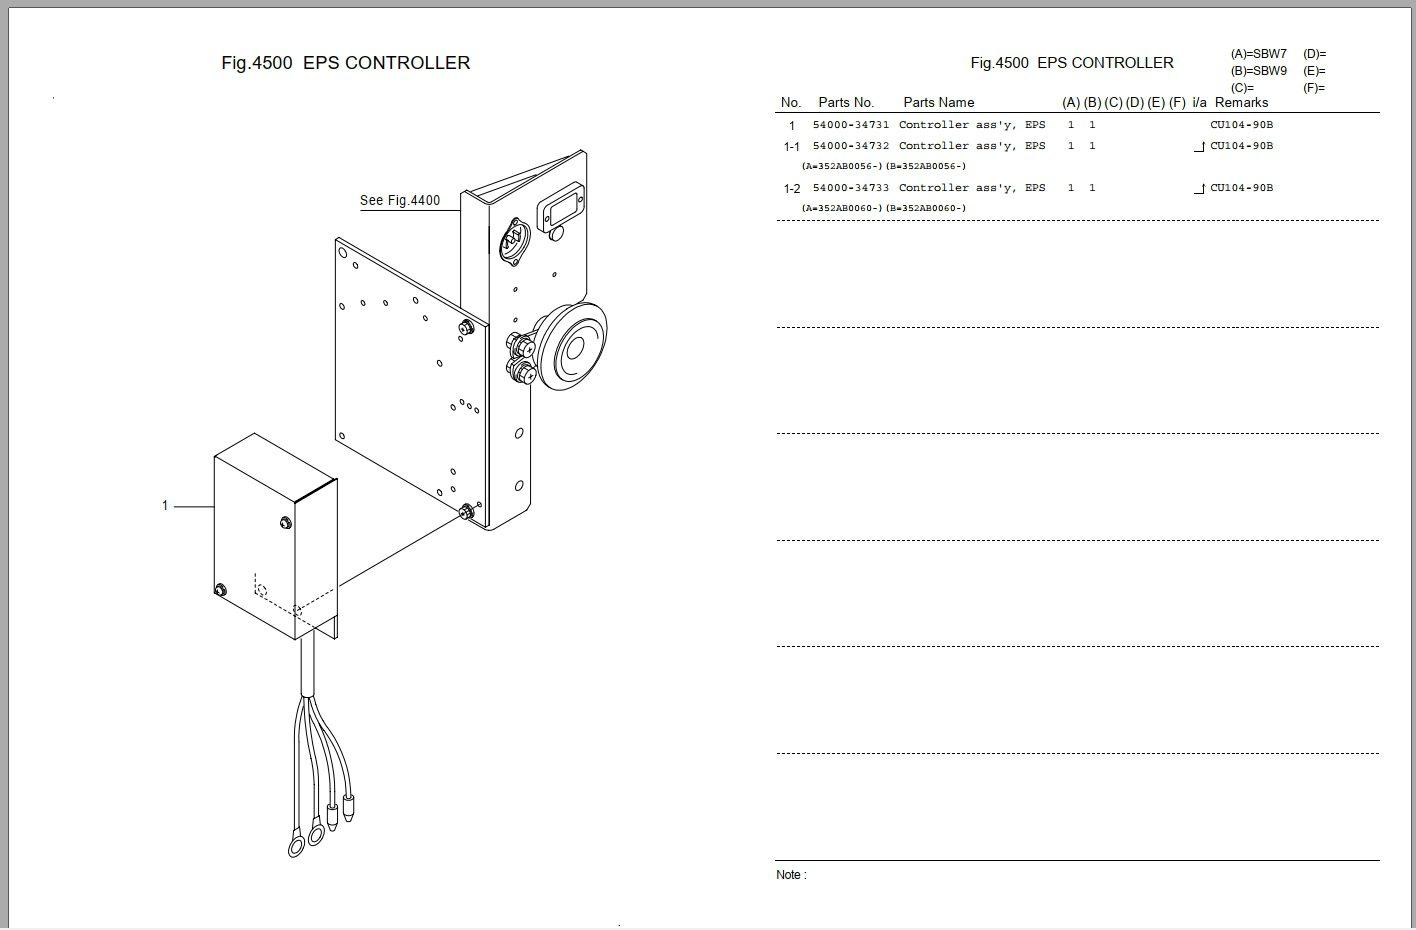 Nichiyu Forklift Fb Fbr Ht Pld Rb Rft Sbw Full Model Spare